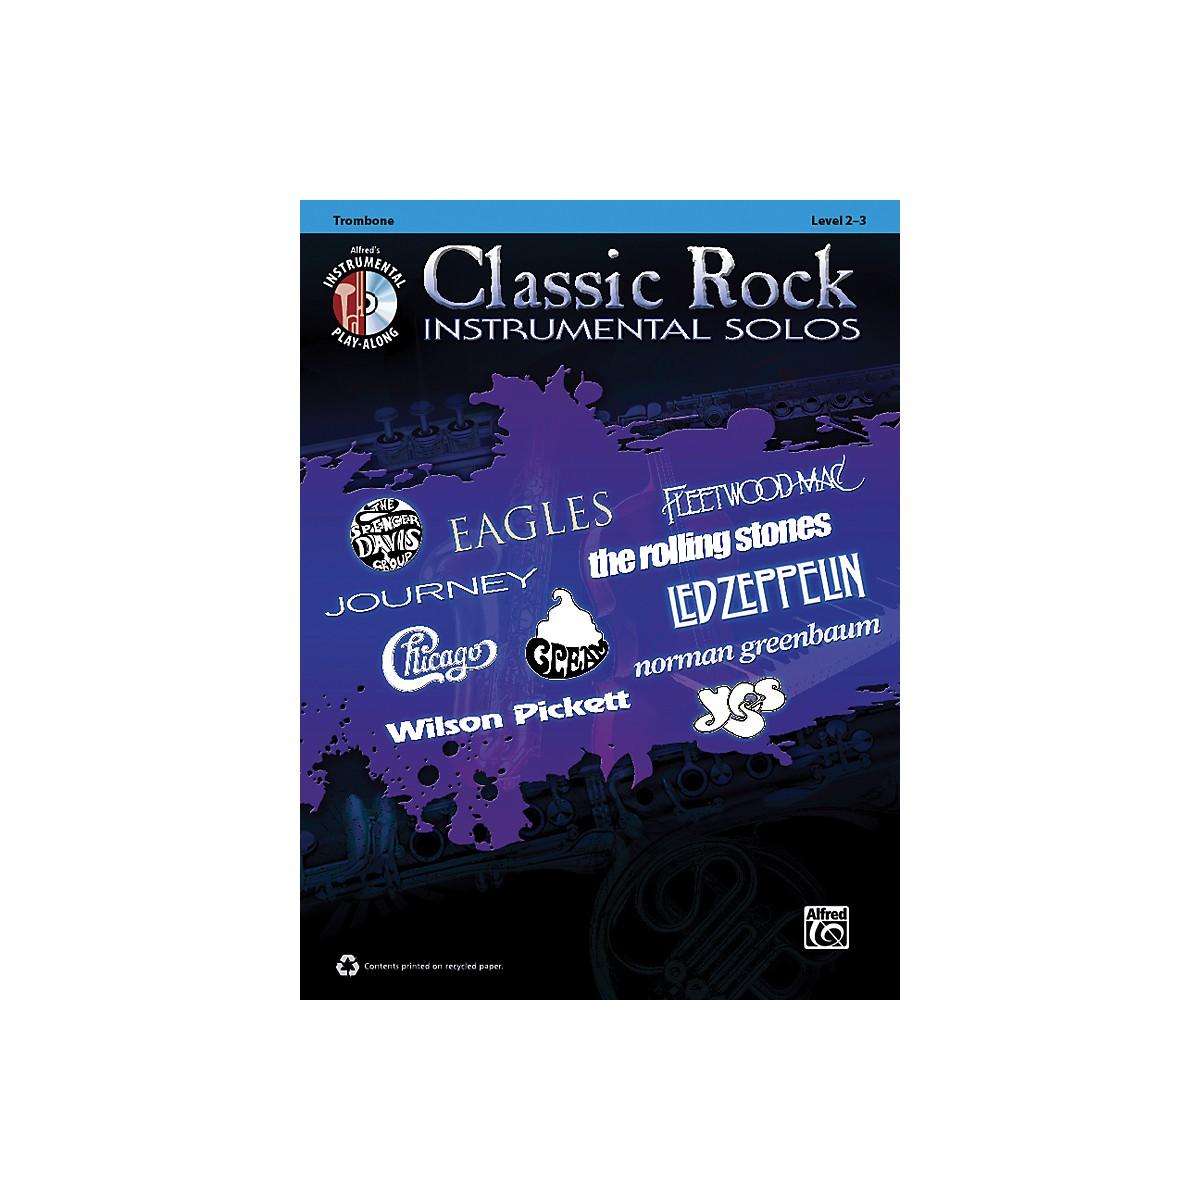 Alfred Classic Rock Instrumental Solos Trombone Book & CD